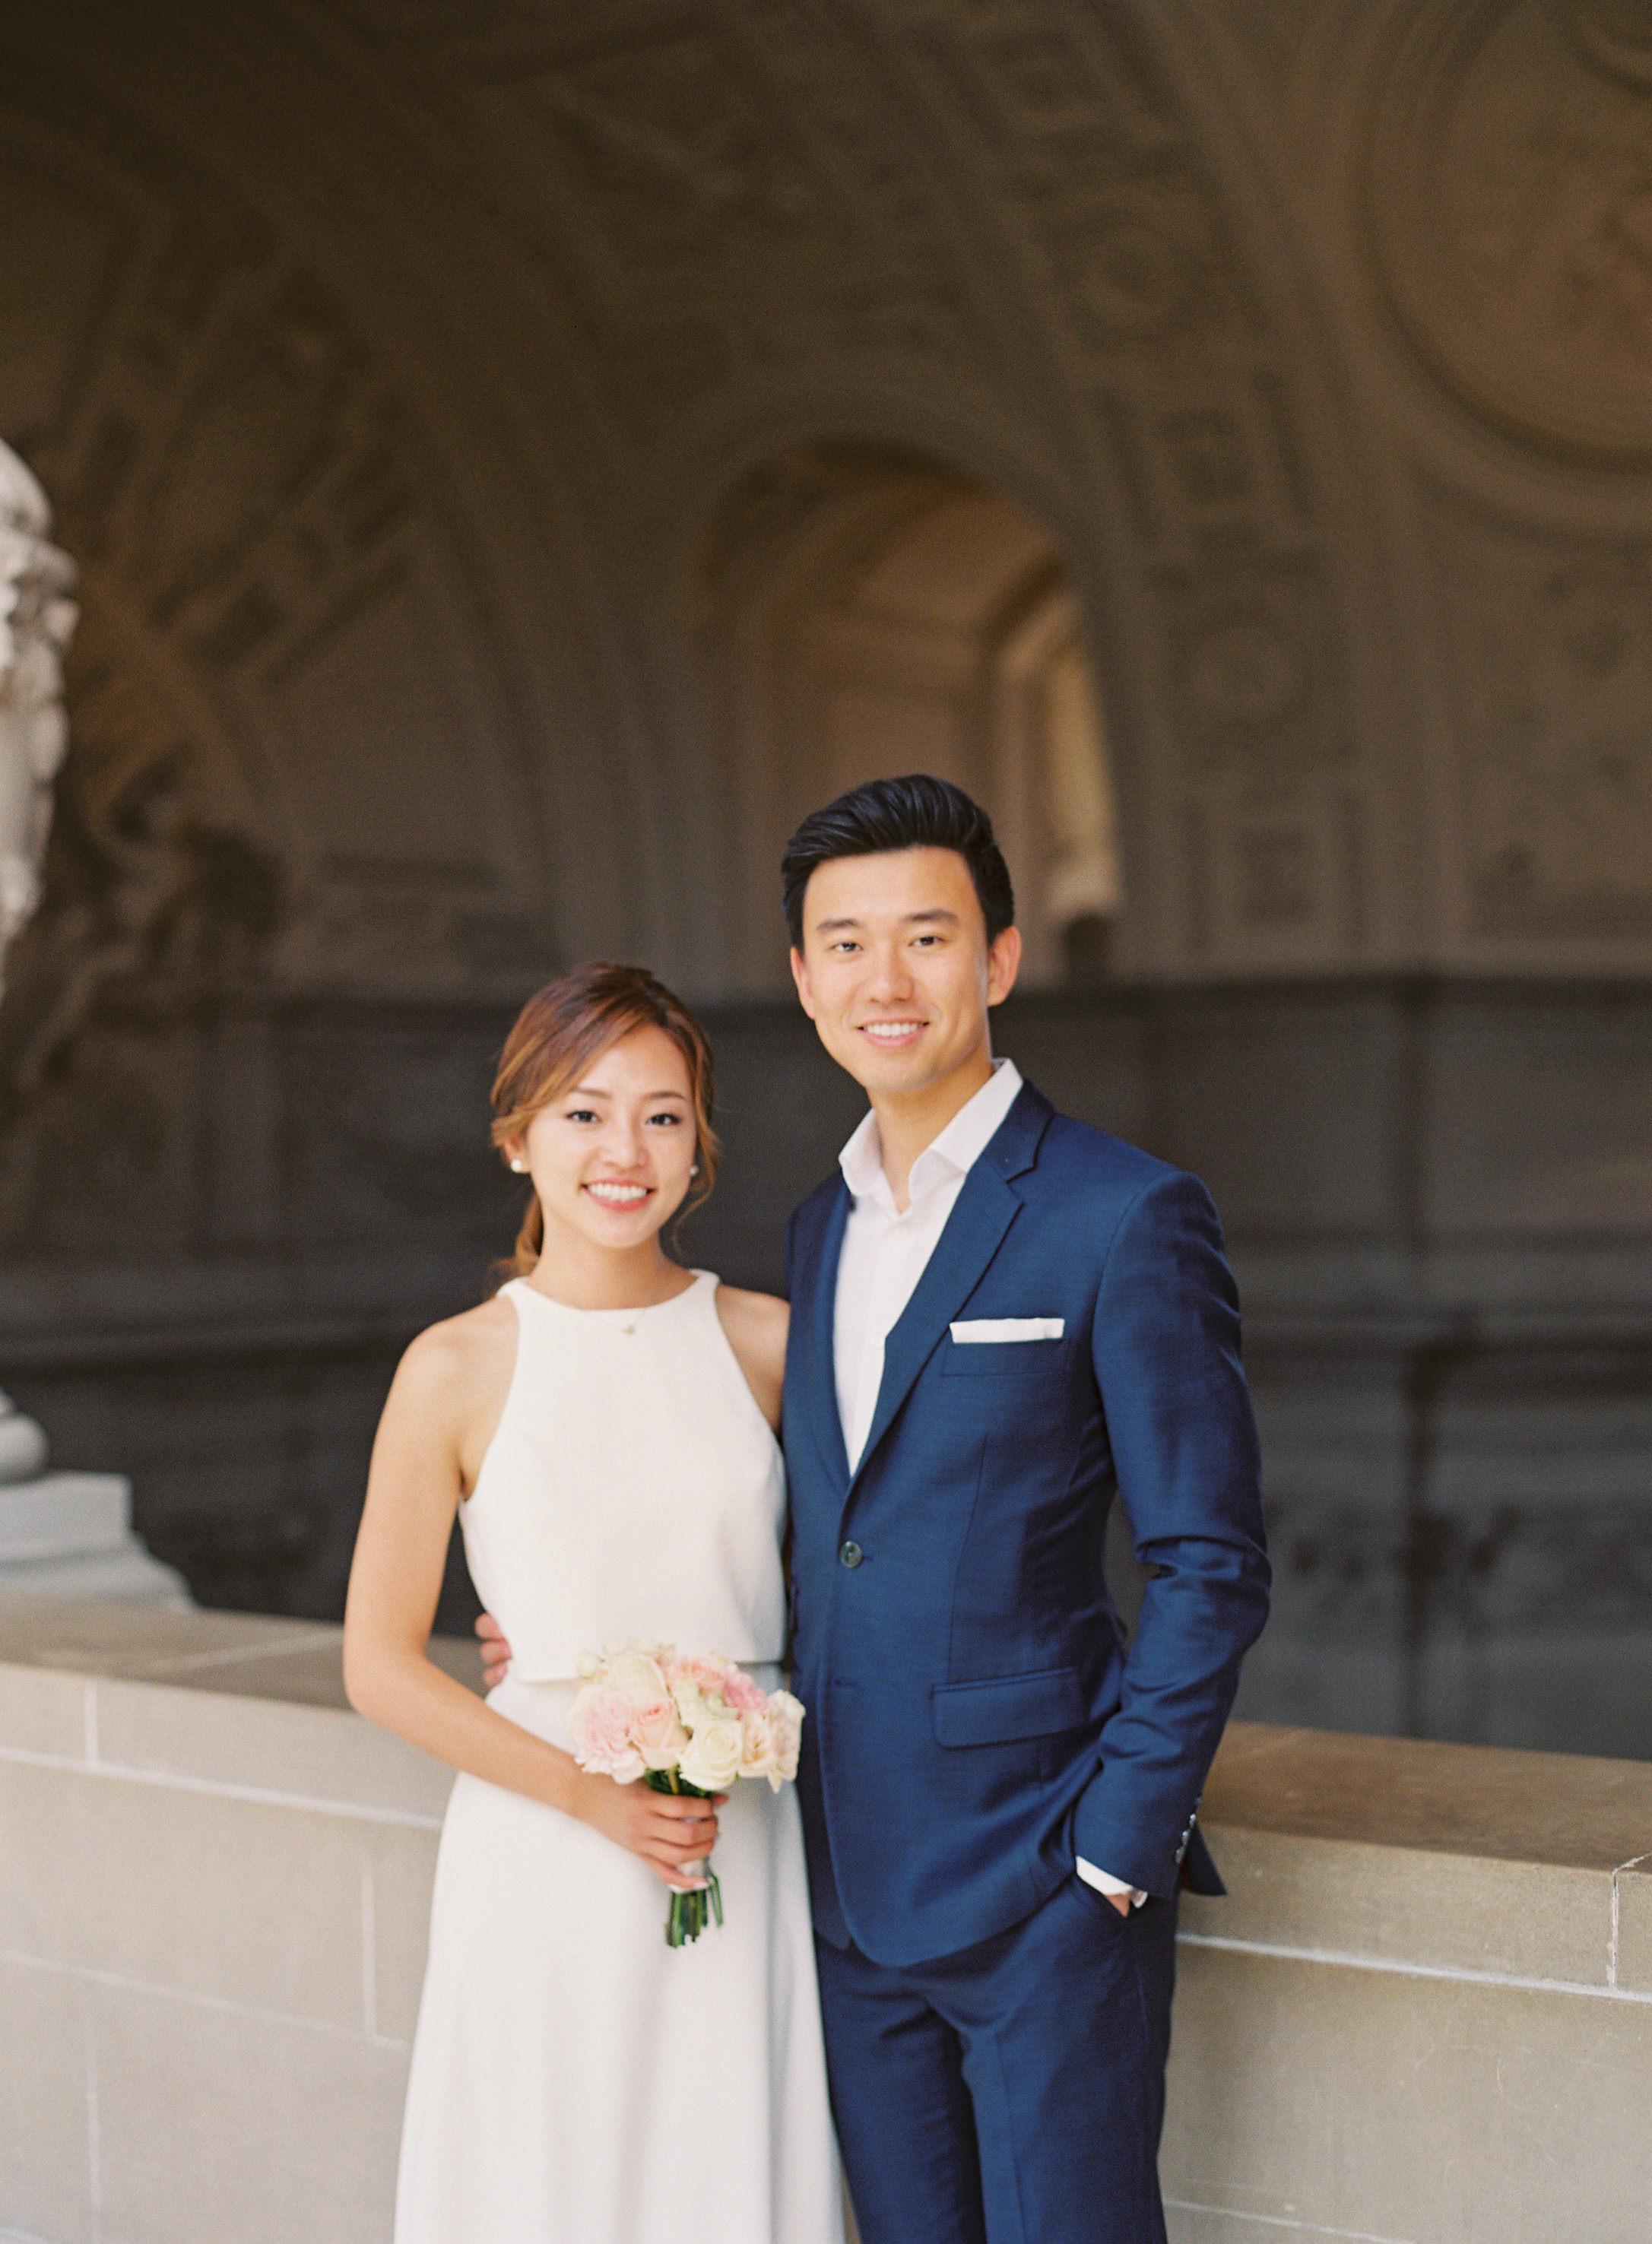 San-francisco-city-hall-photography-wedding-027.jpg